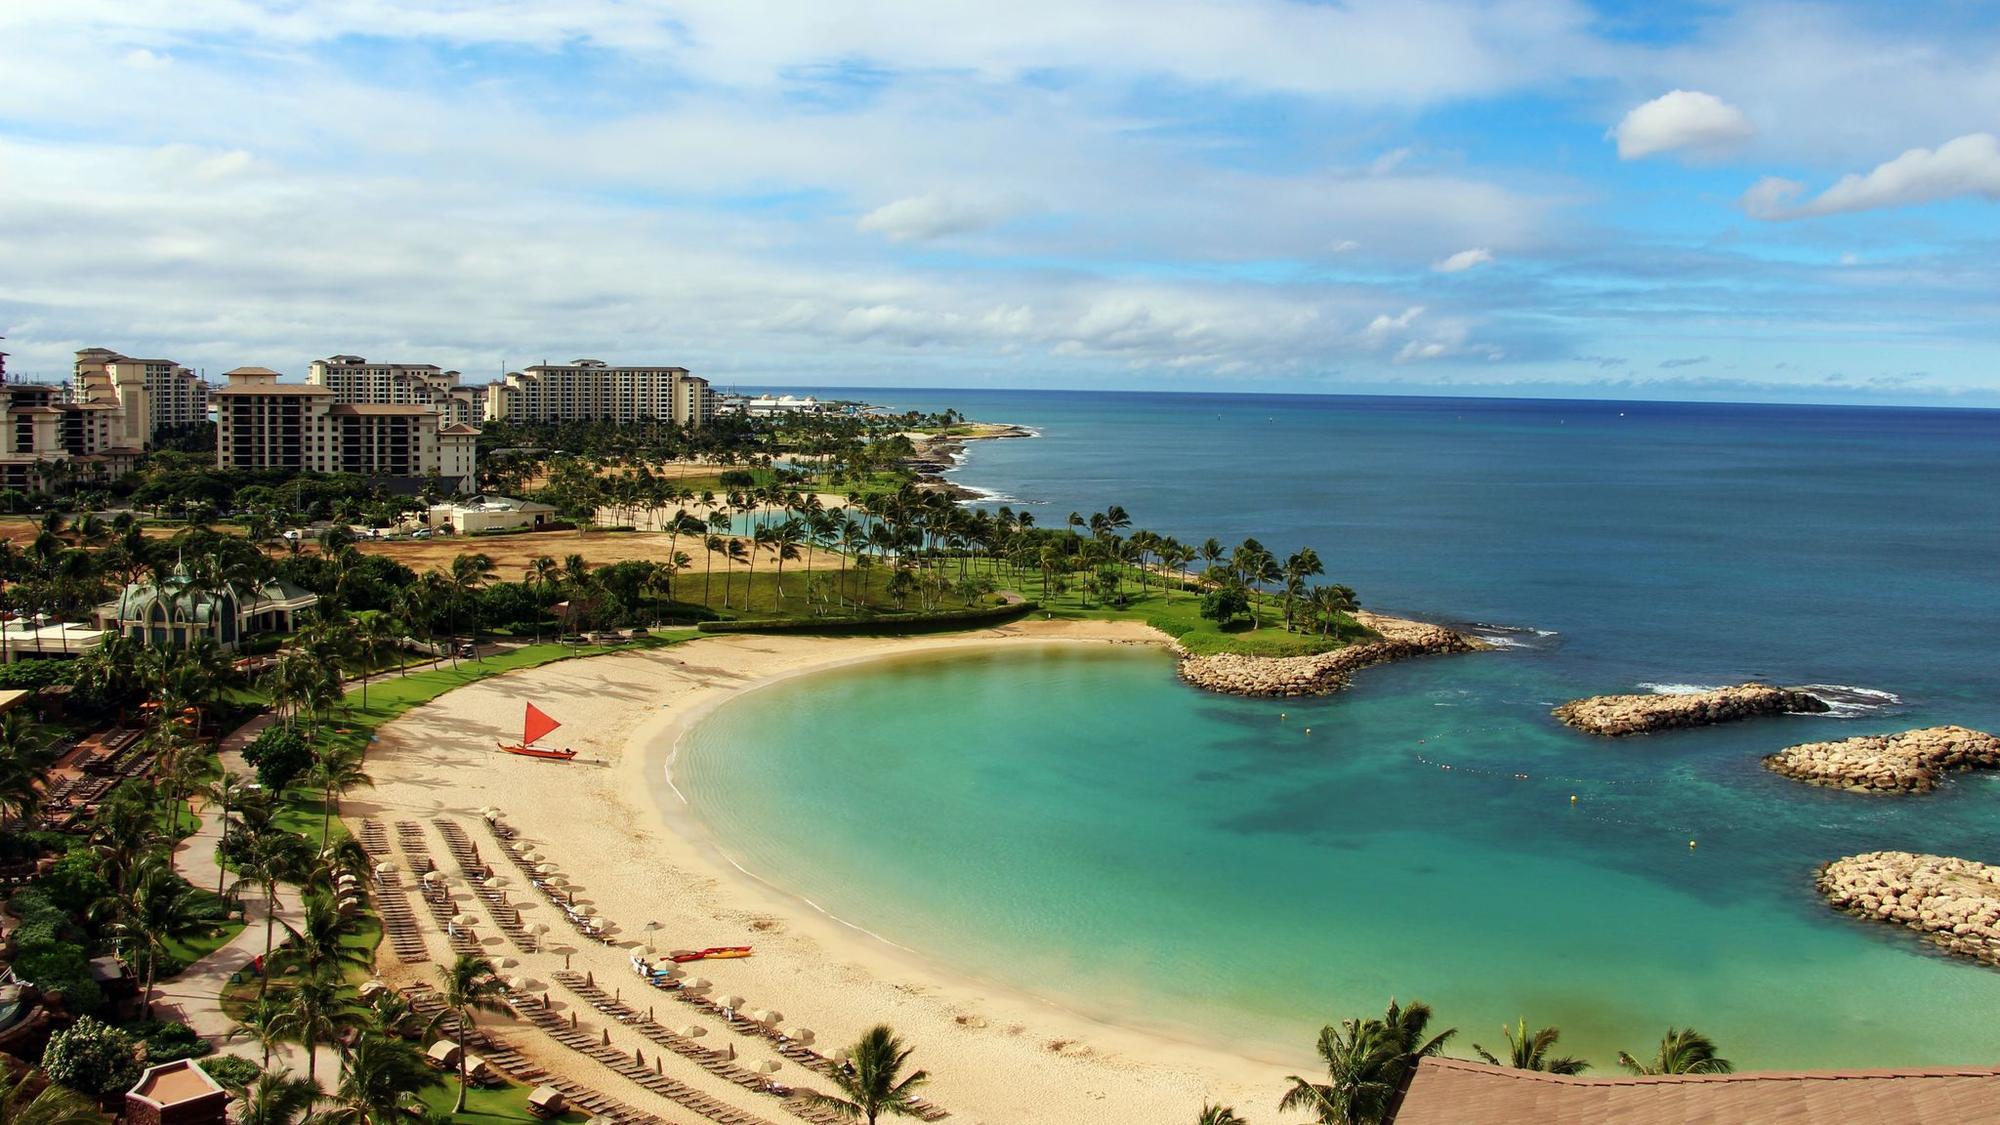 View of Ko Olina beach and the Kohola lagoon from the hotel room, Oahu, Hawaii.